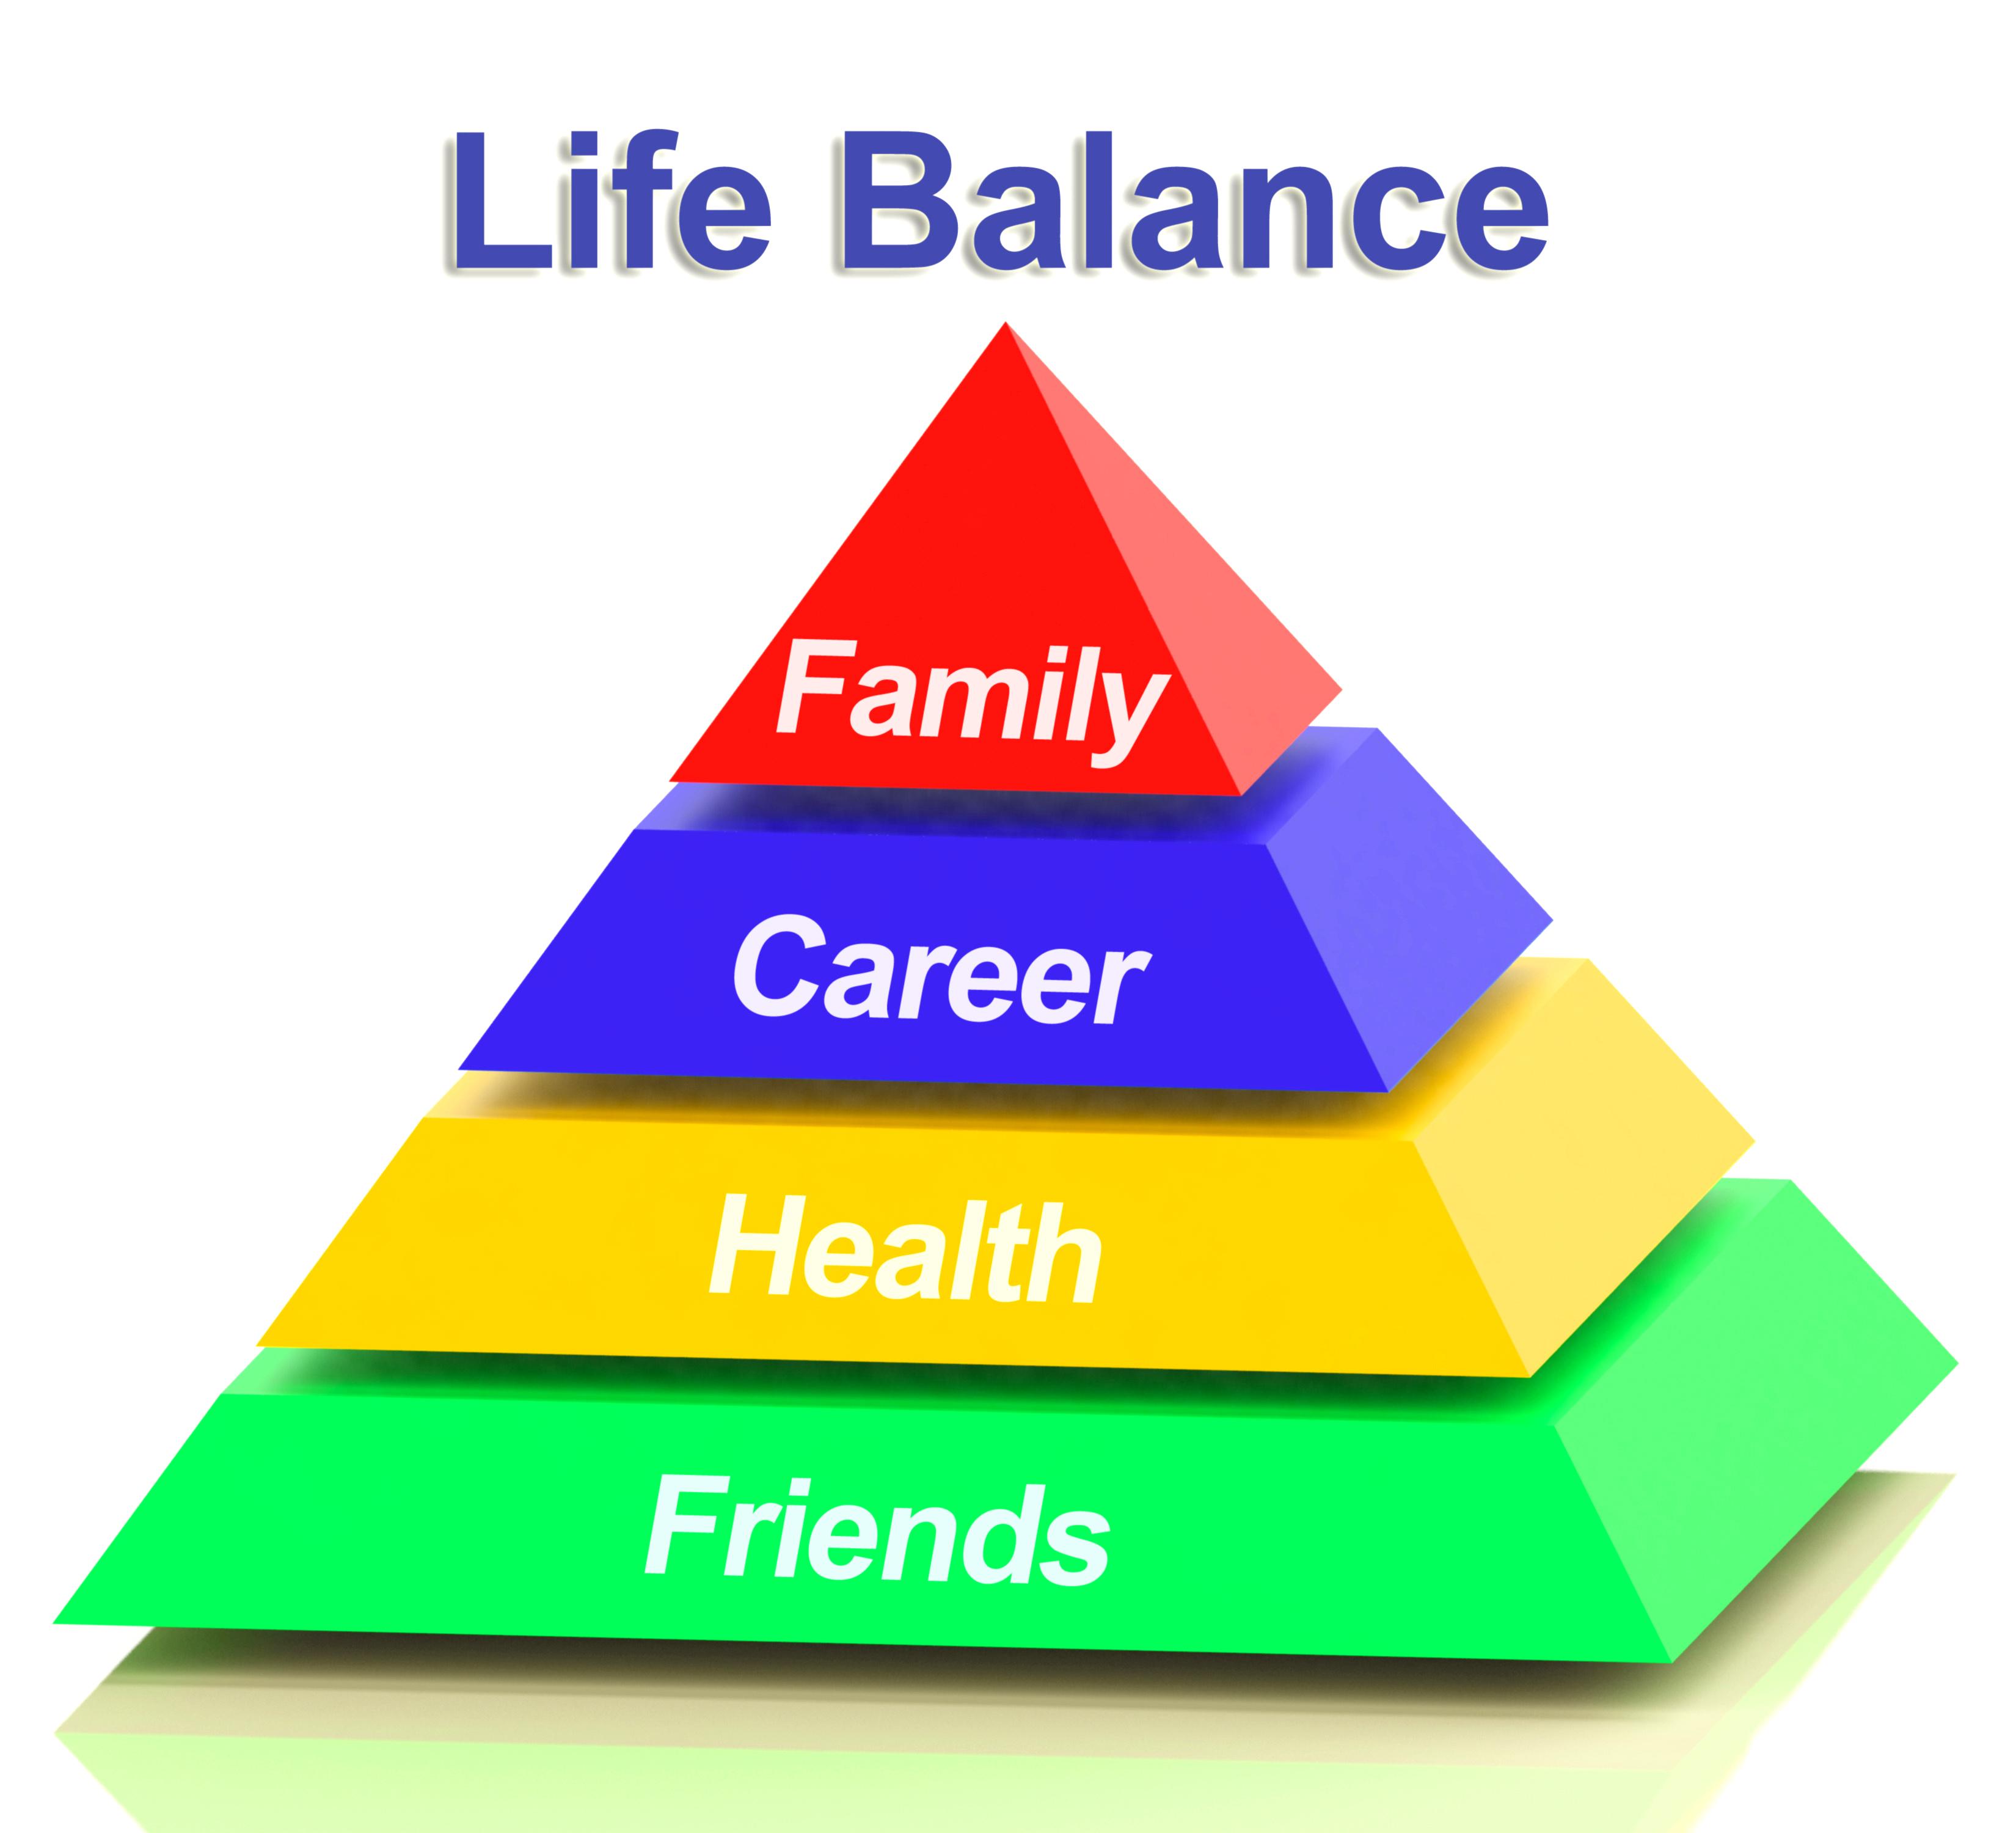 Life Balance Pyramid